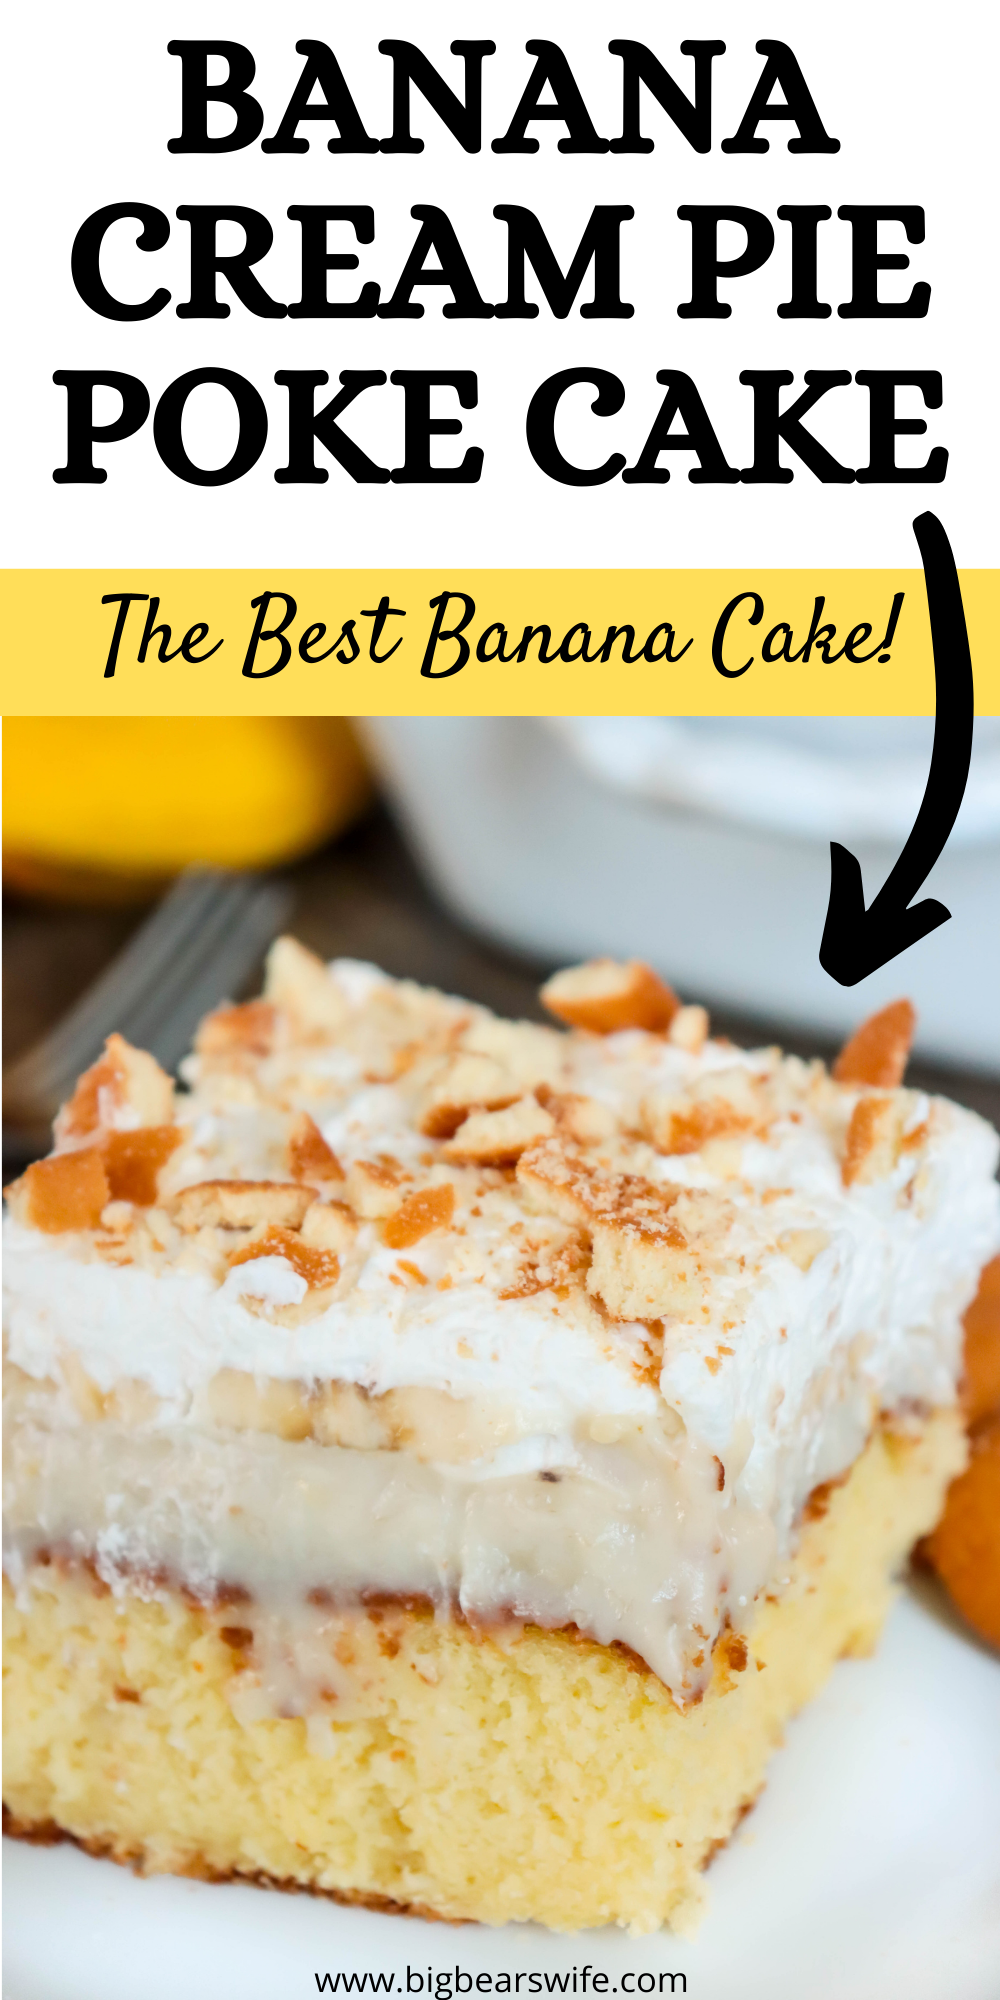 Combine a banana cream pie and southern poke cake to make the perfect southern party dessert! This banana cake has layers of homemade yellow cake, homemade banana pudding, slices of fresh bananas and homemade Crème Chantilly! via @bigbearswife